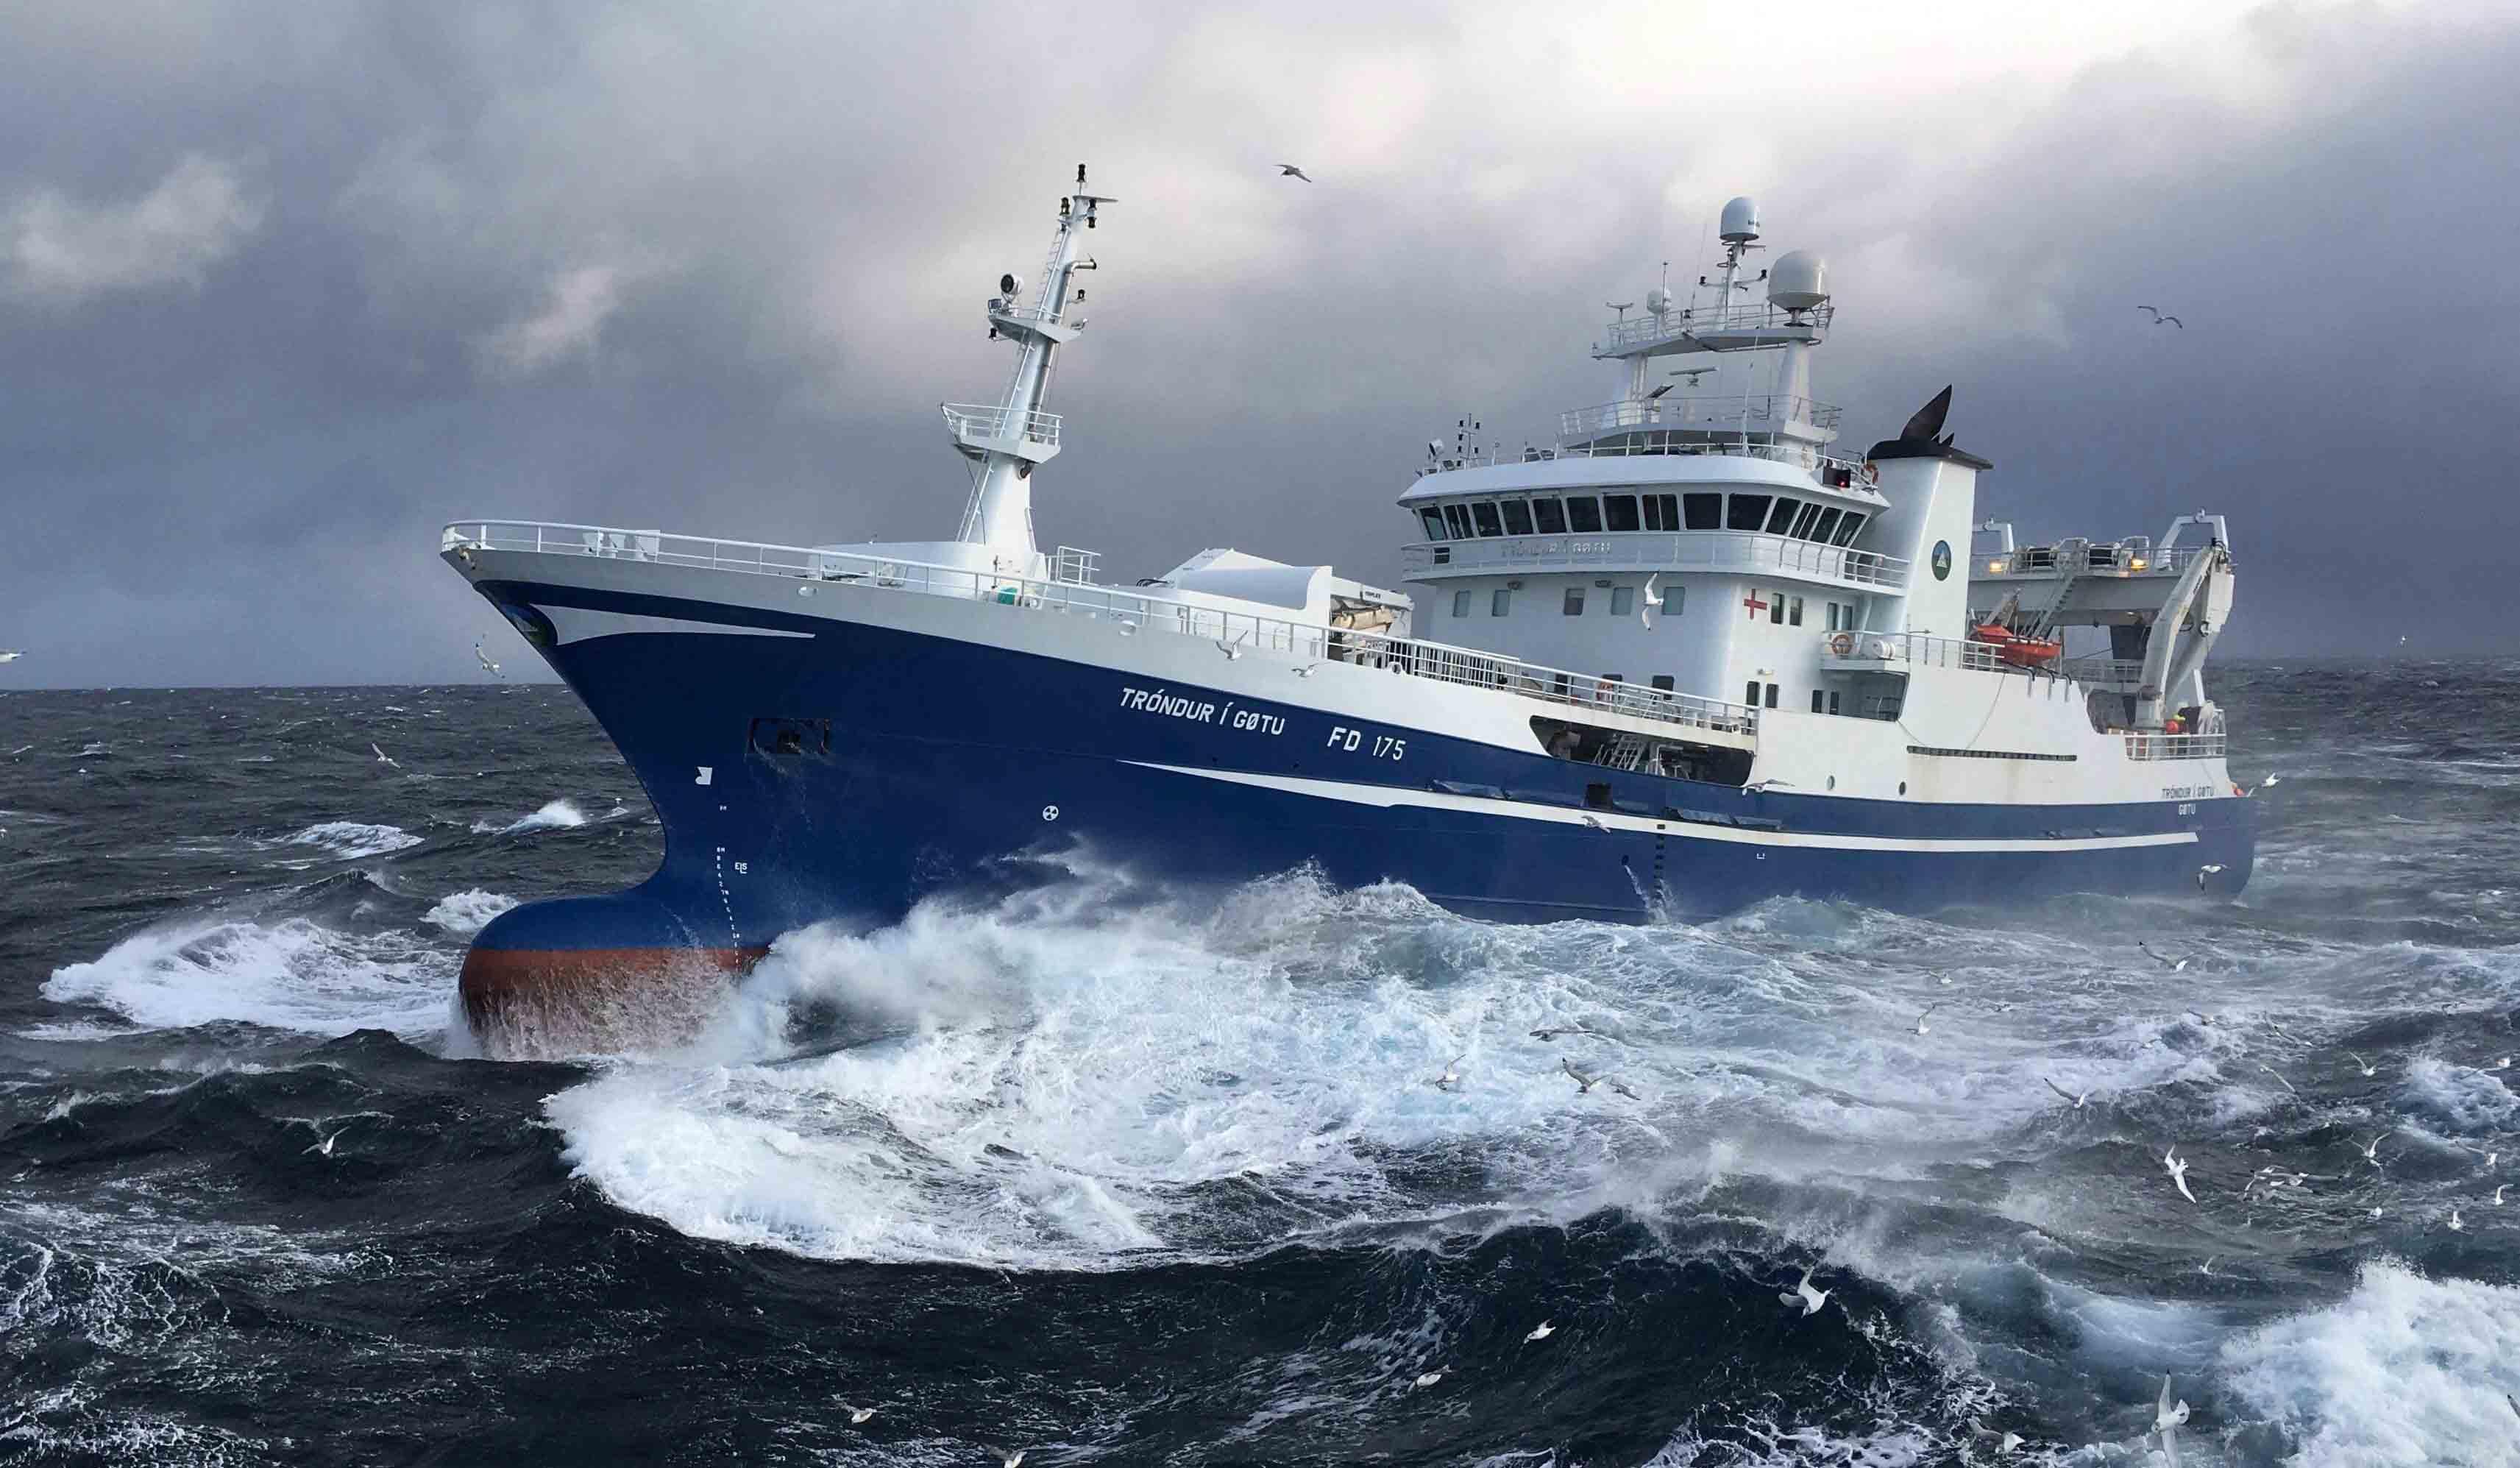 Faroese fishing ship